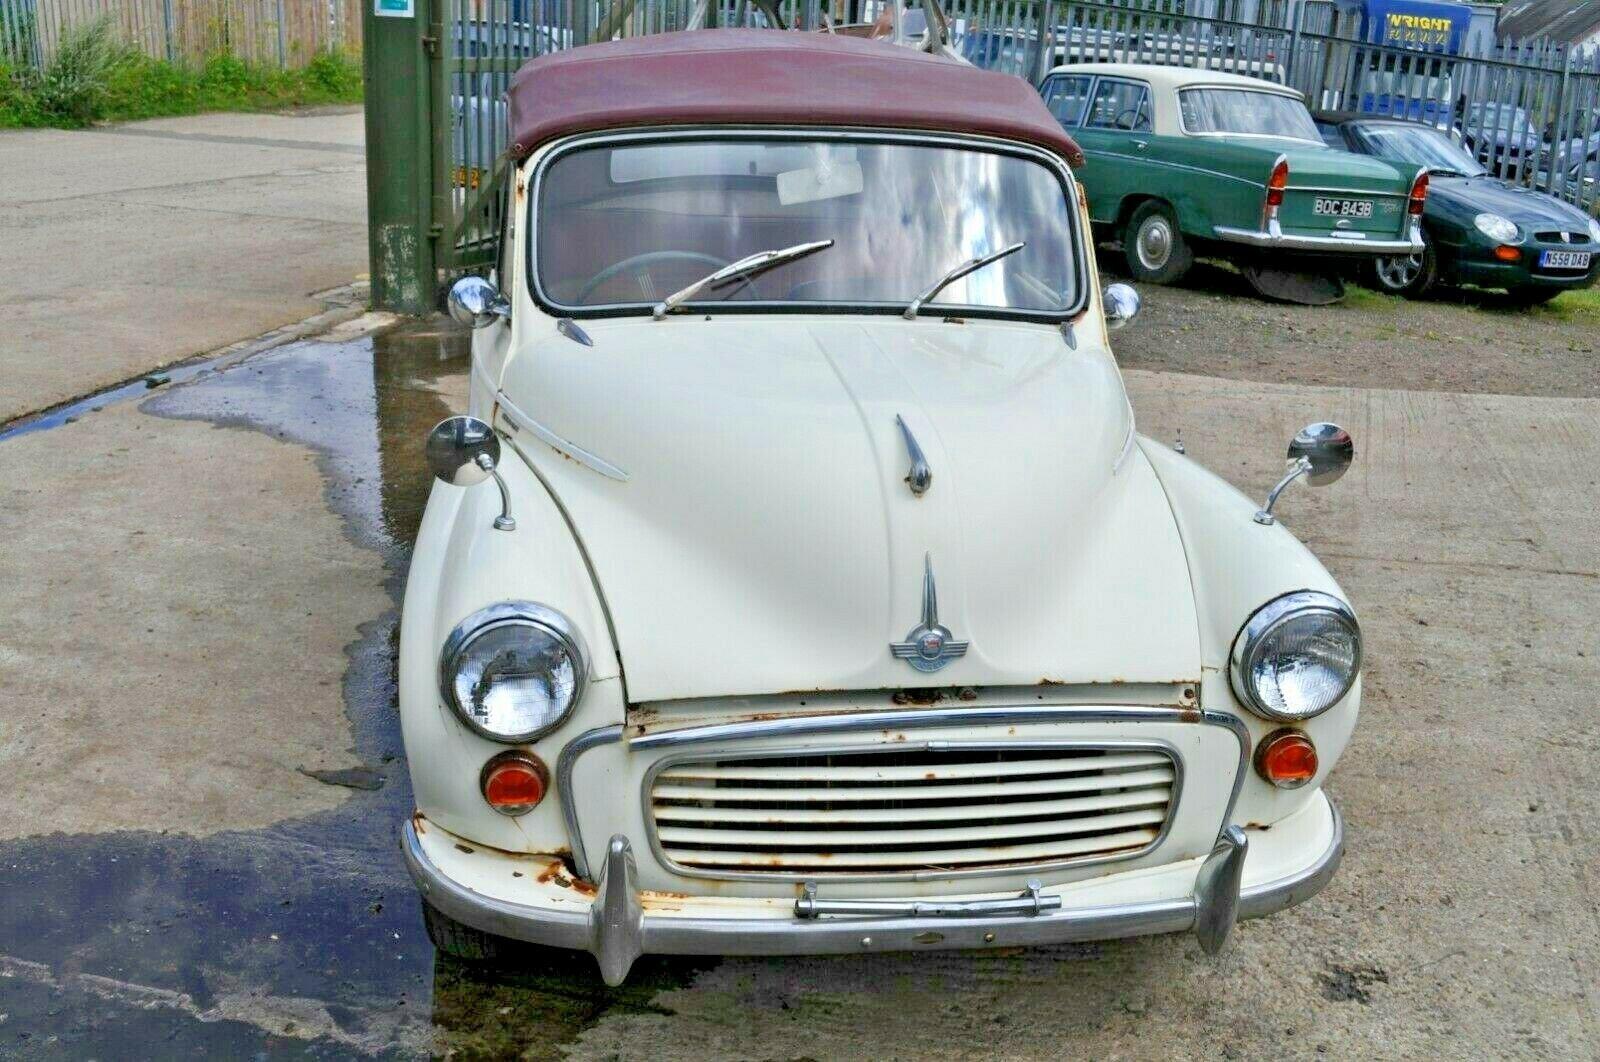 1963 MORRIS MINOR CONVERTIBLE 2 DOOR 1000 CLASSIC CAR PROJECT SOLD (picture 1 of 6)